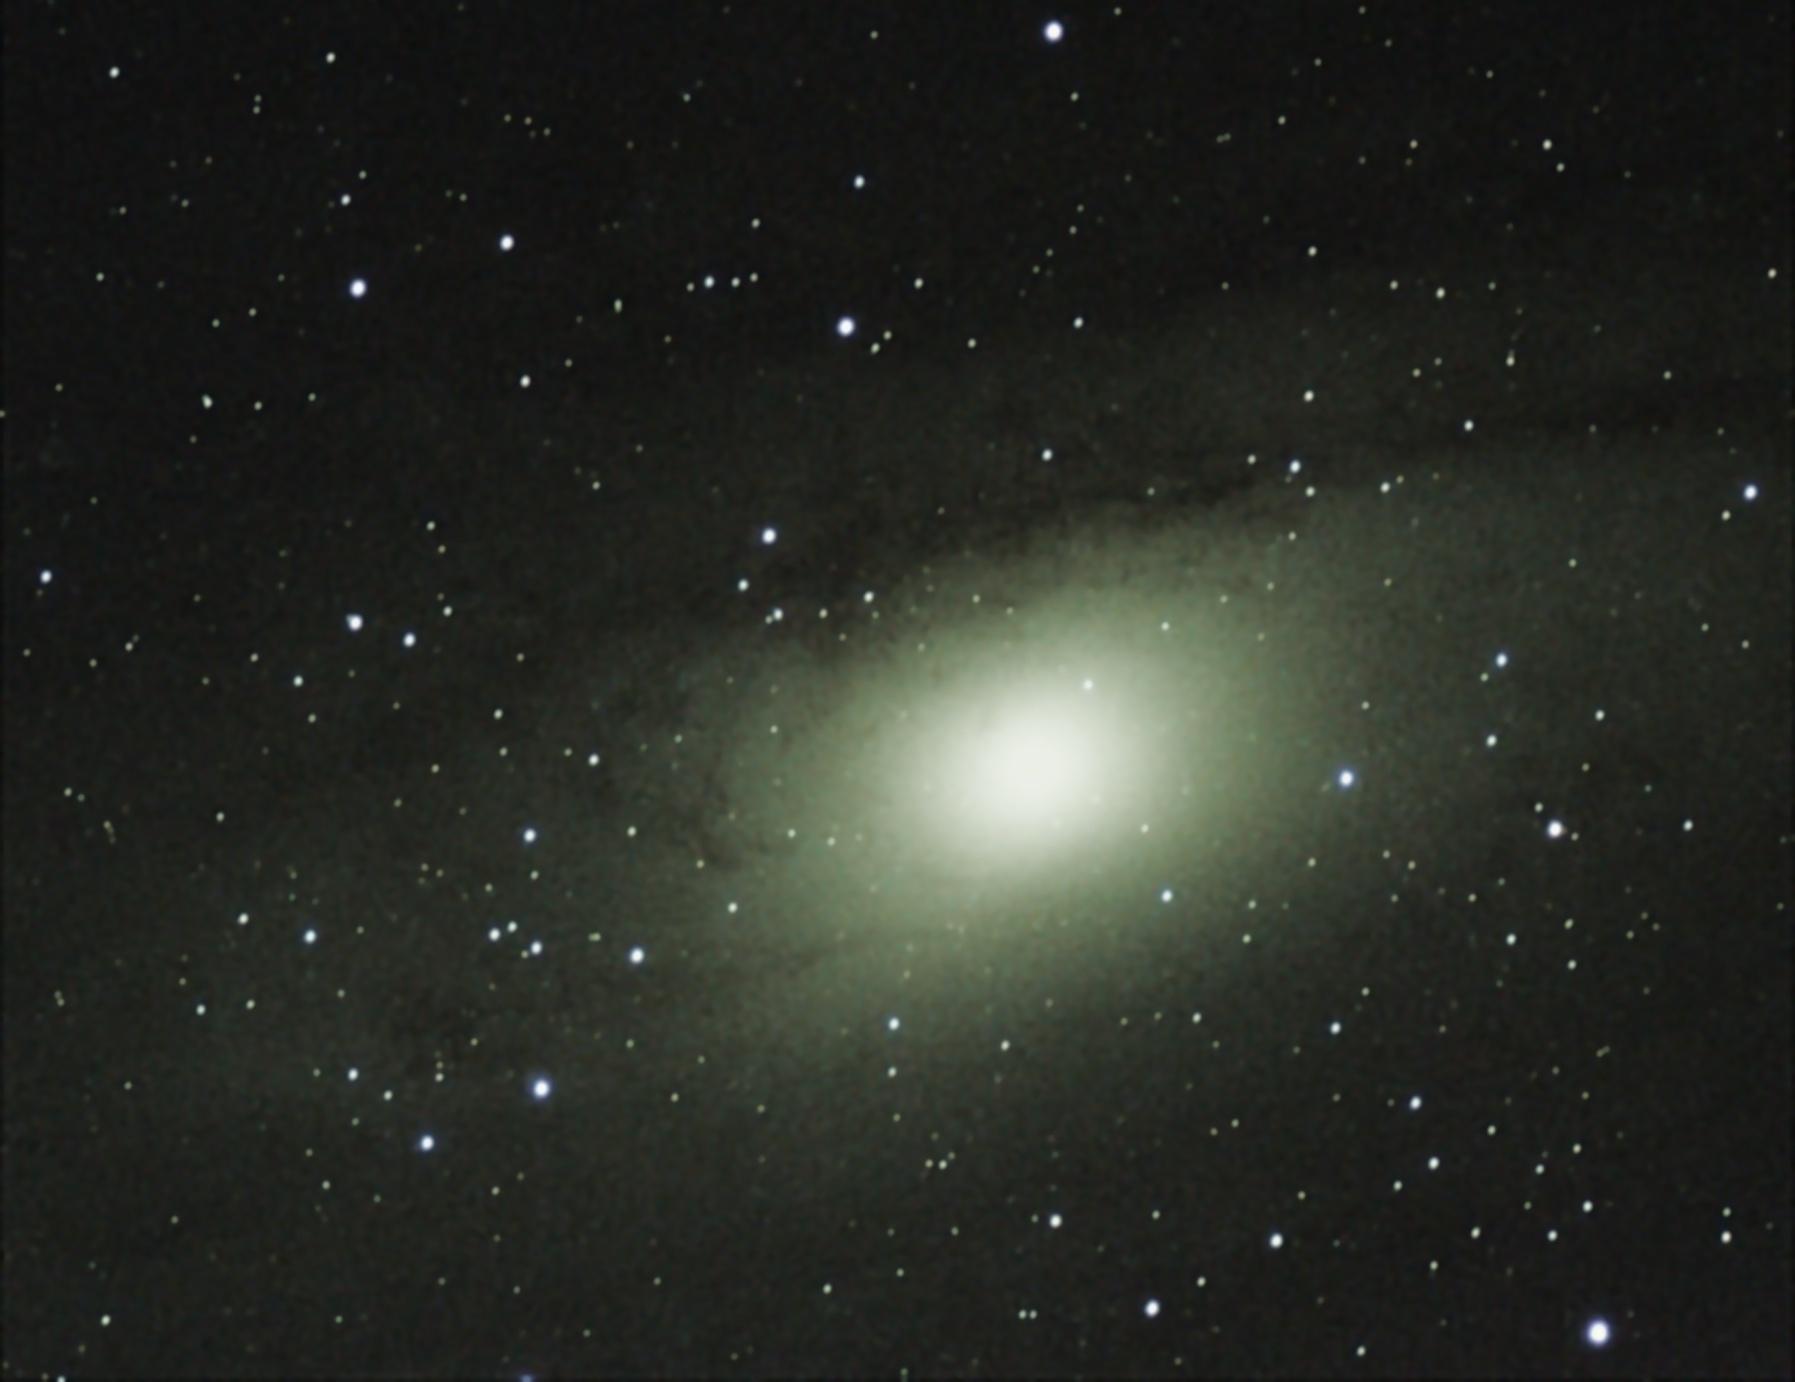 M31c.jpg.0548467bdd7e83a70fea7959377abaa6.jpg